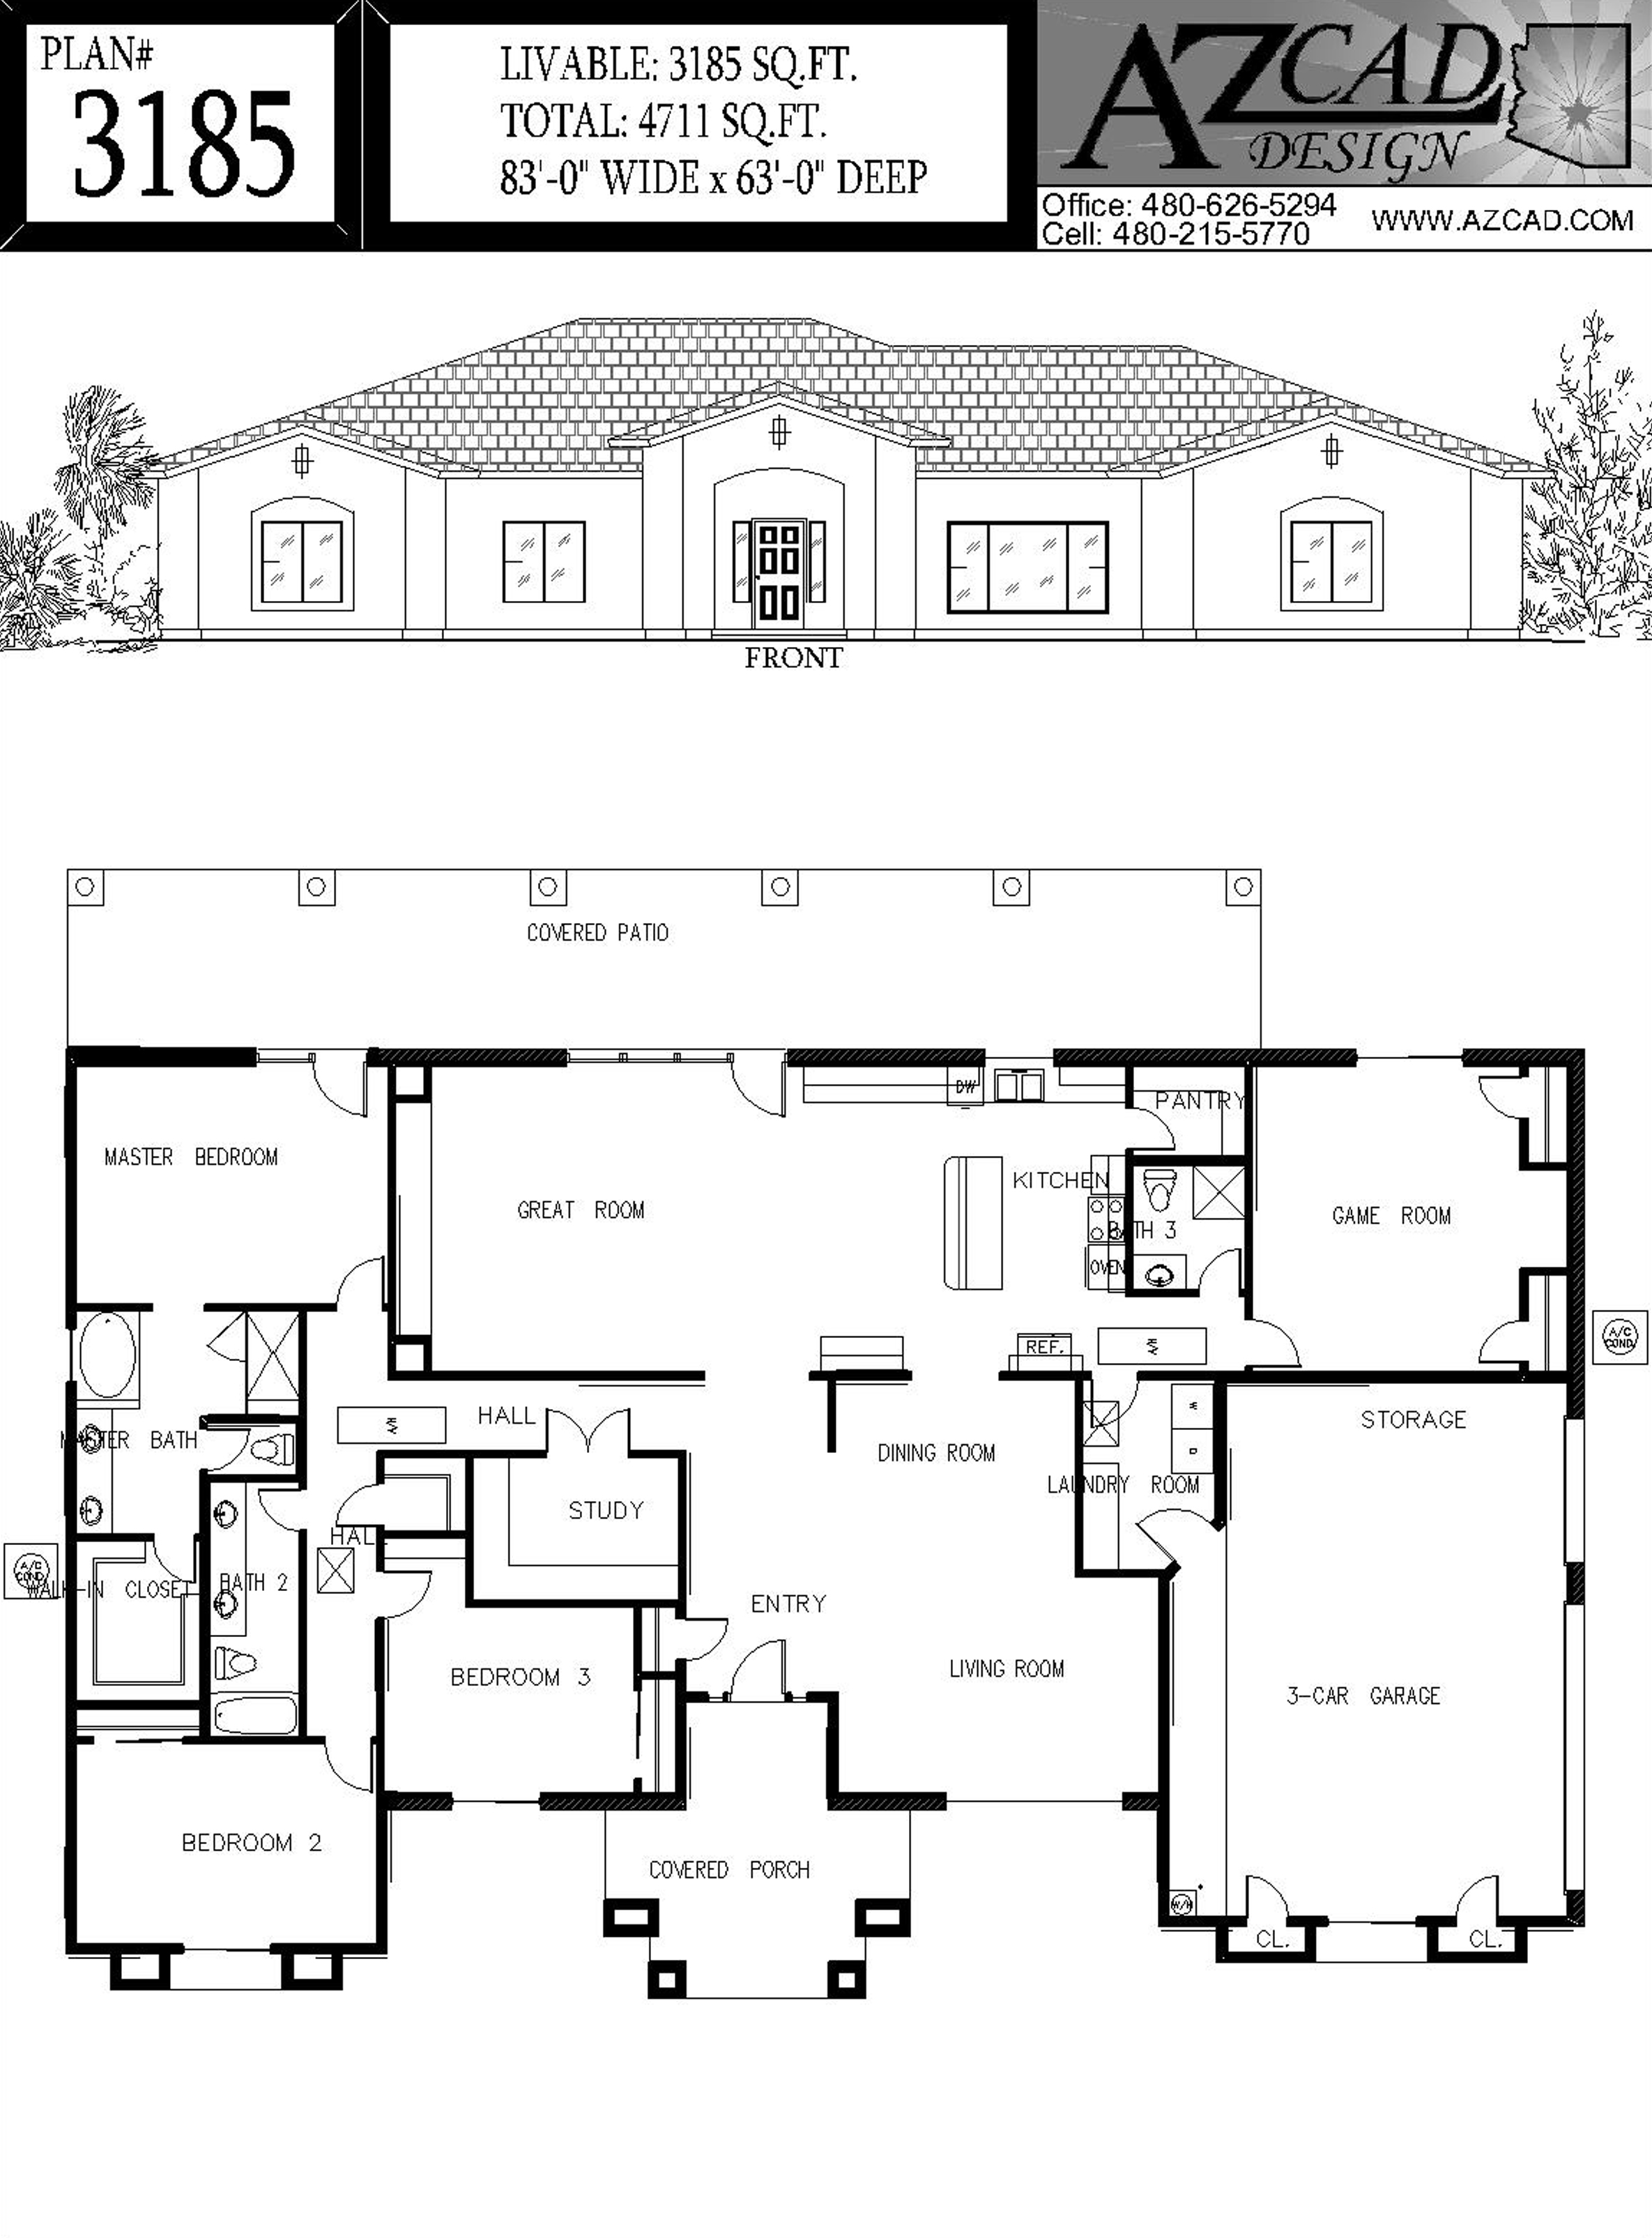 Drafting arizona house plans floor plans for Arizona house plans